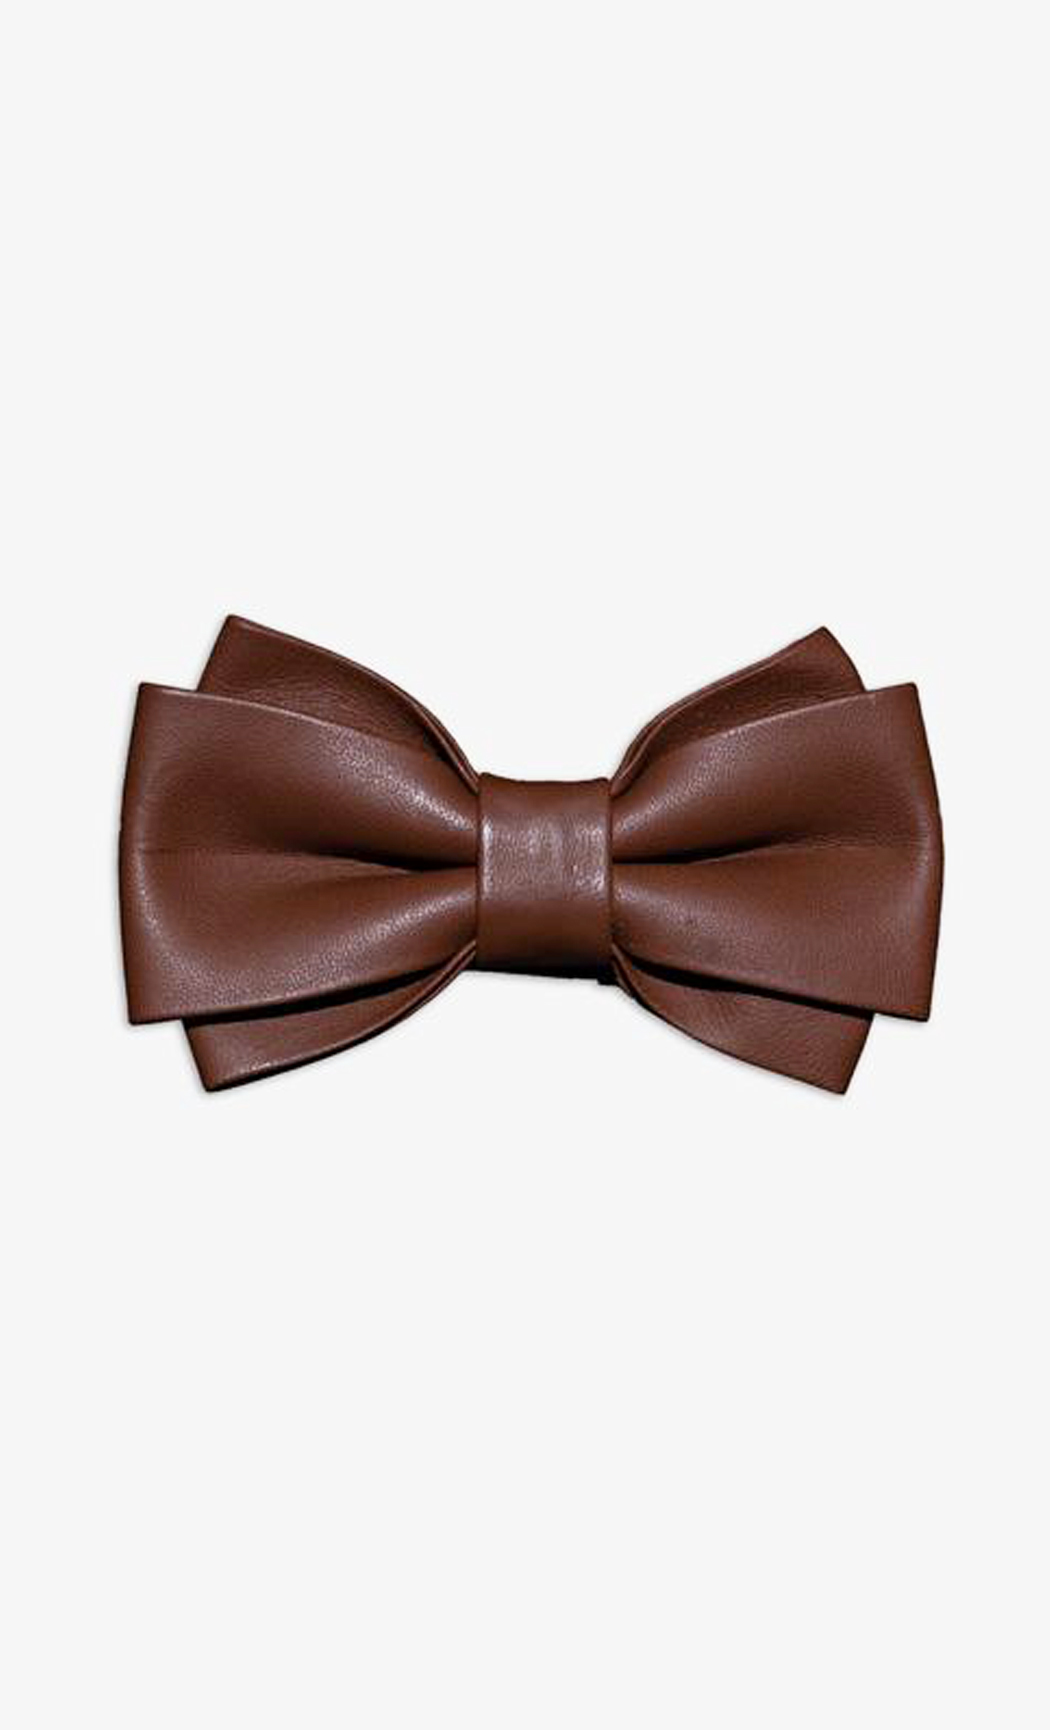 Dark Brown Genuine Leather Twin Wide Bow Tie. Buy Online